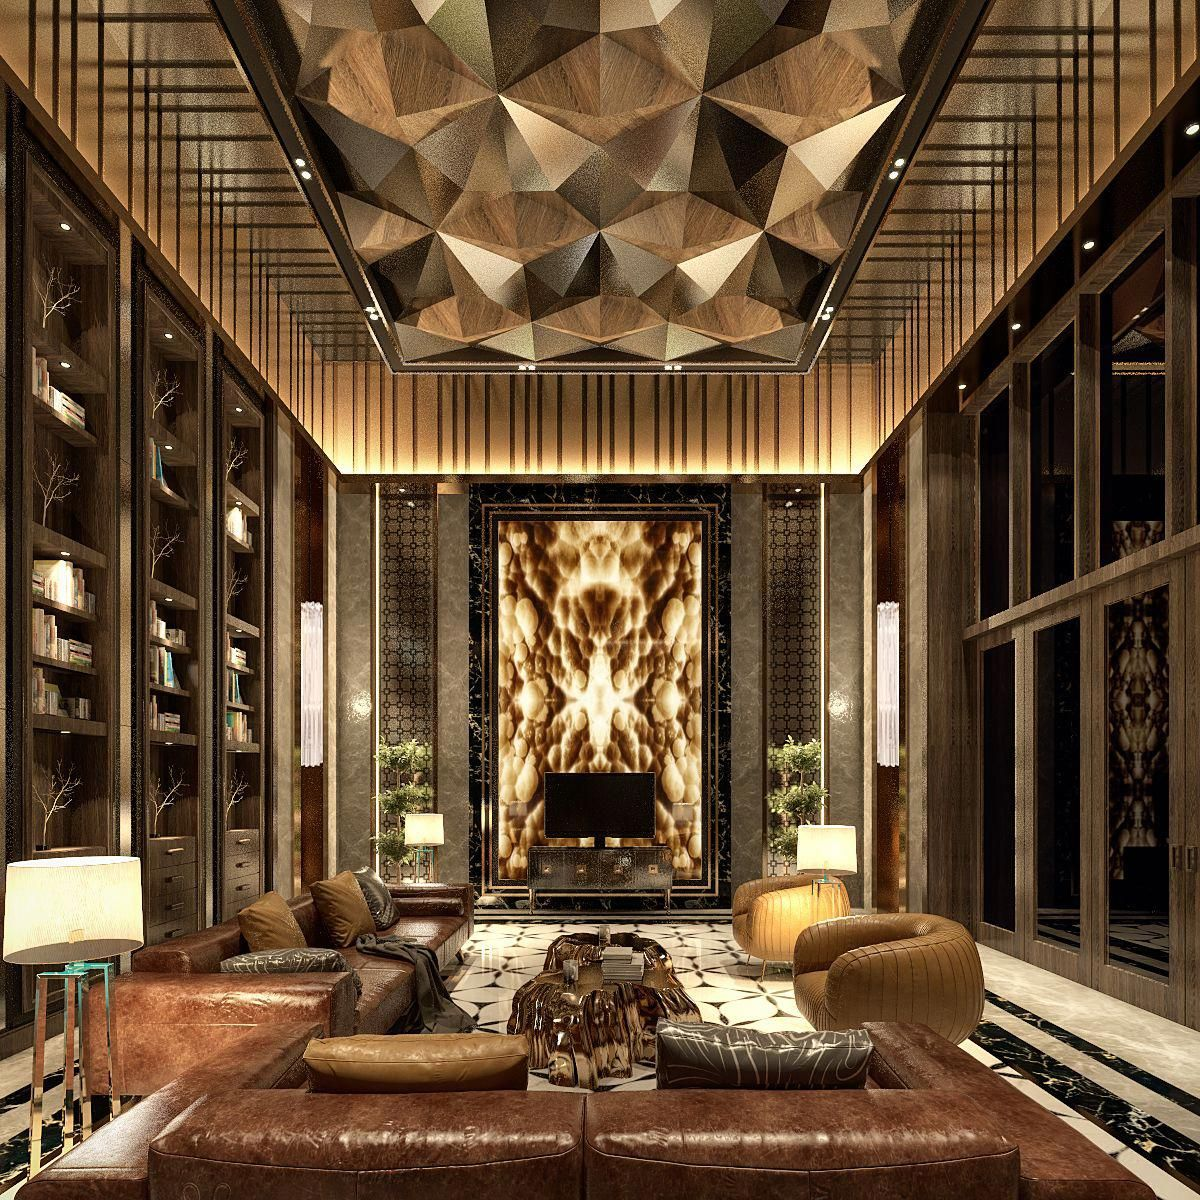 Luxury Interior Design Living Room: Room Techniques And Strategies For Contemporary Interior